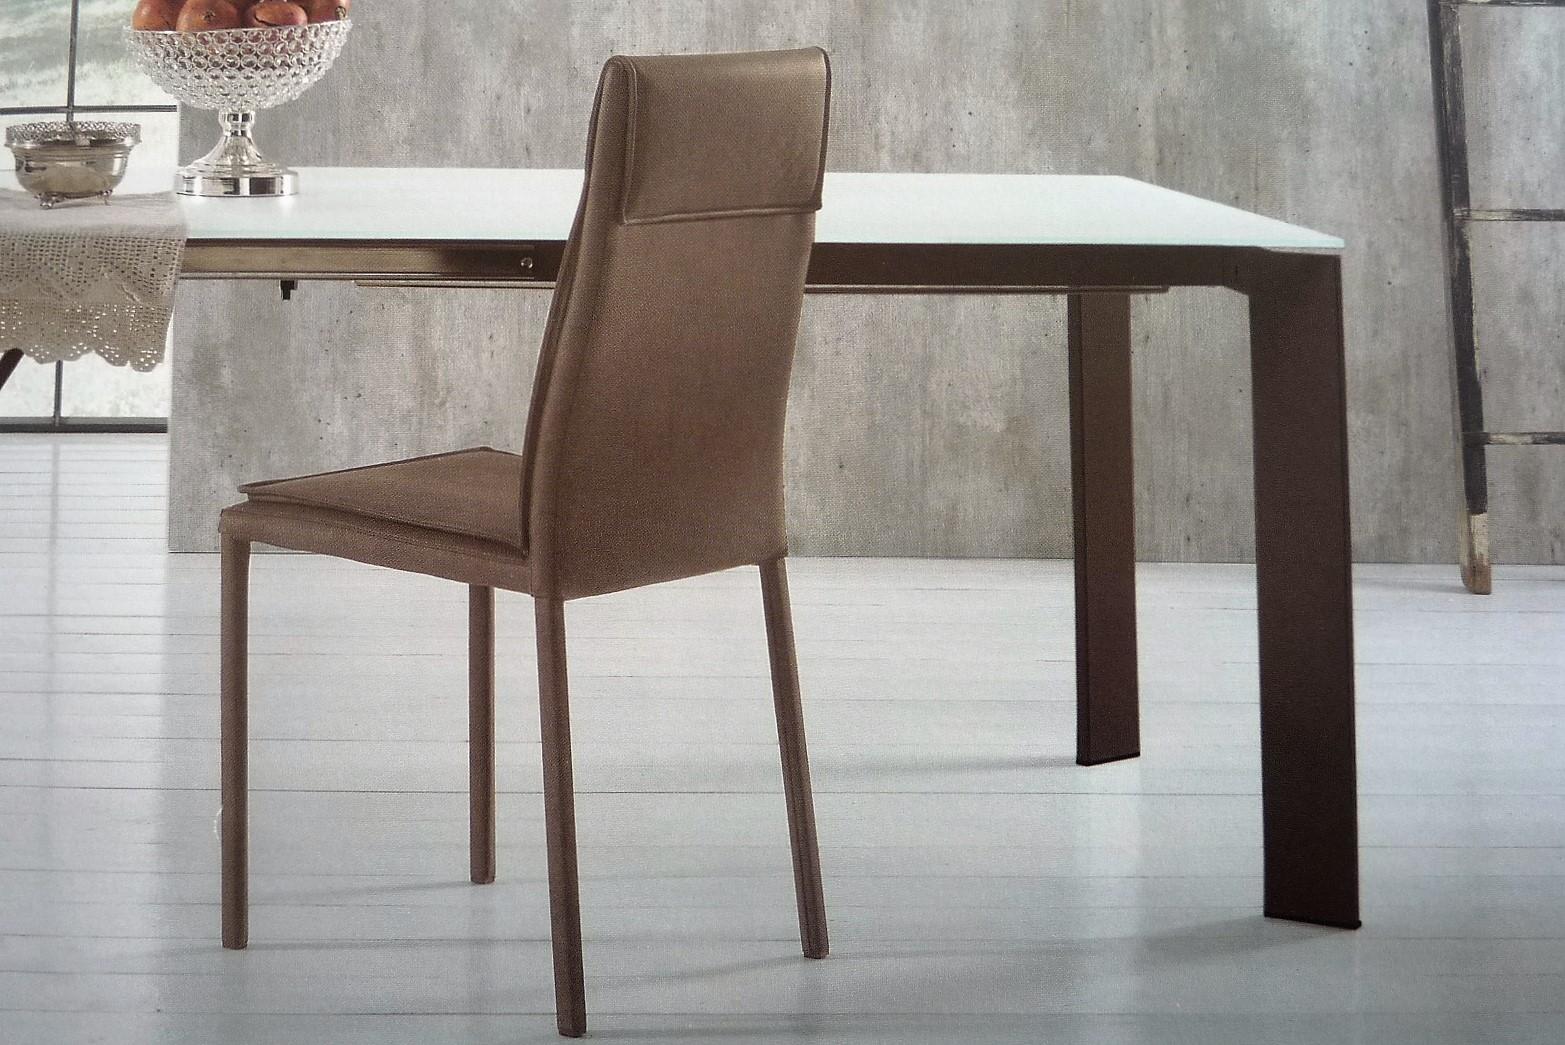 Sedie cucina moderna zamagna modello kilt sedie a prezzi for Sedie cucina prezzi